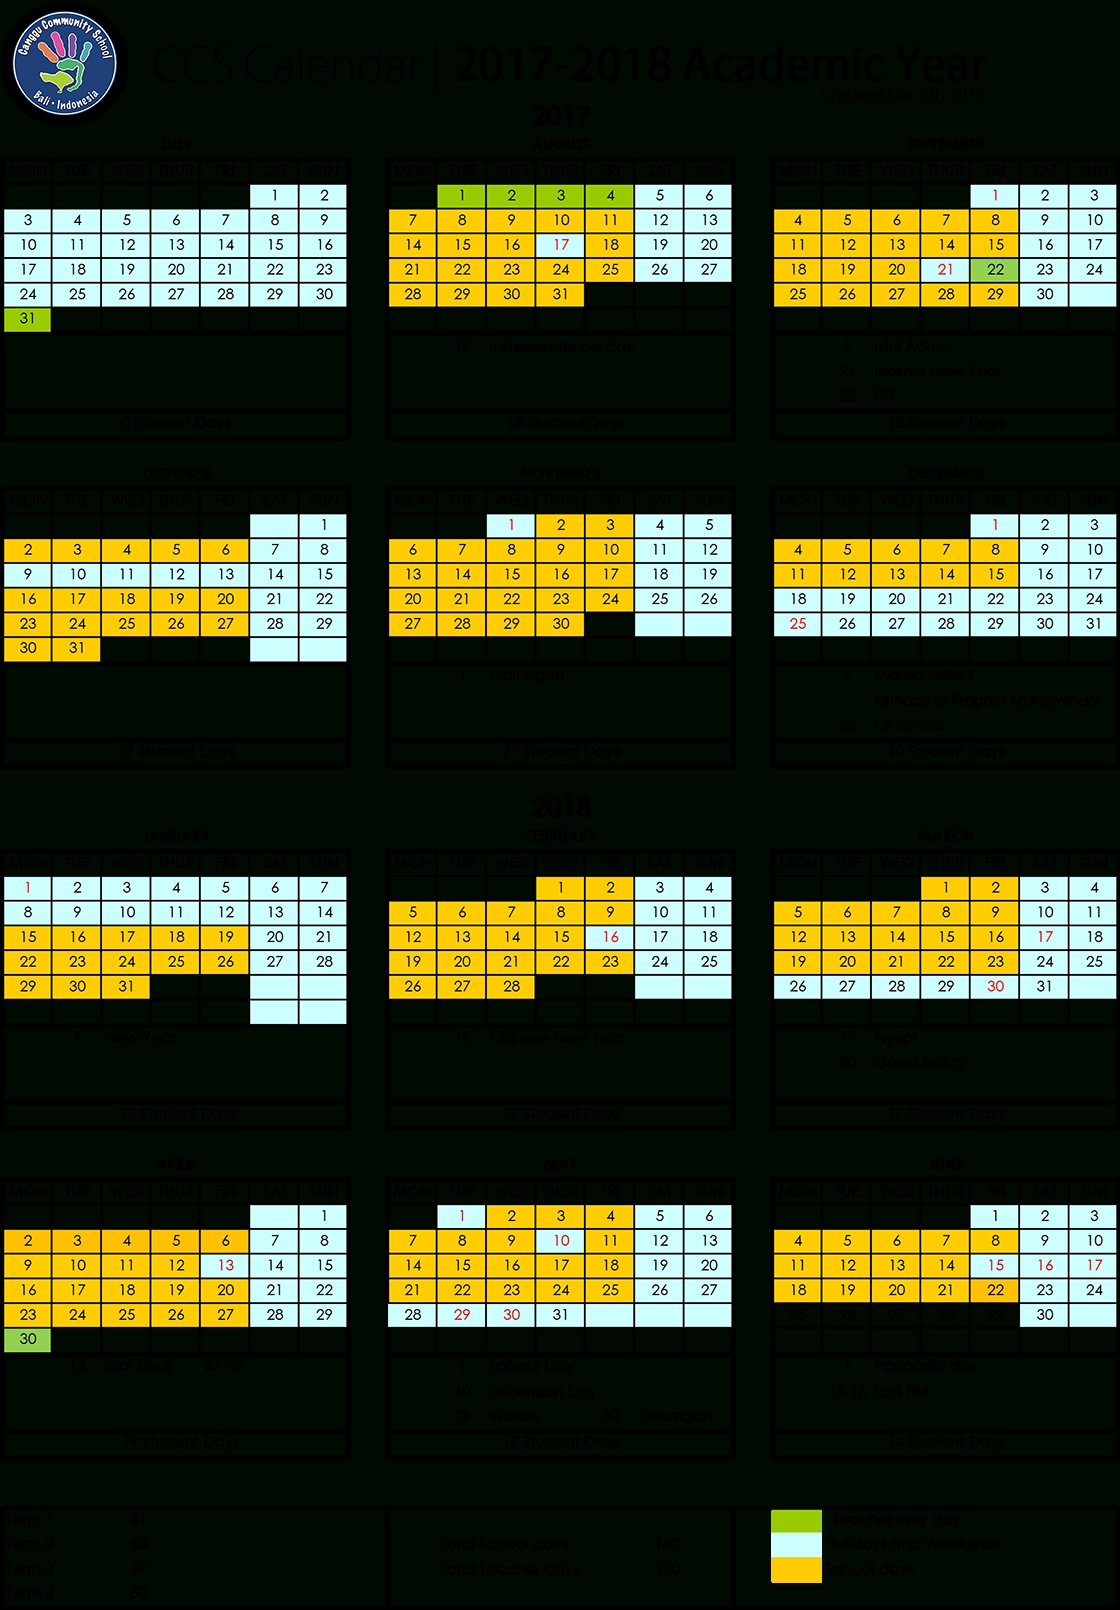 2019   Calendars 2021 for Ucsb 2019 2021 Calendar Photo